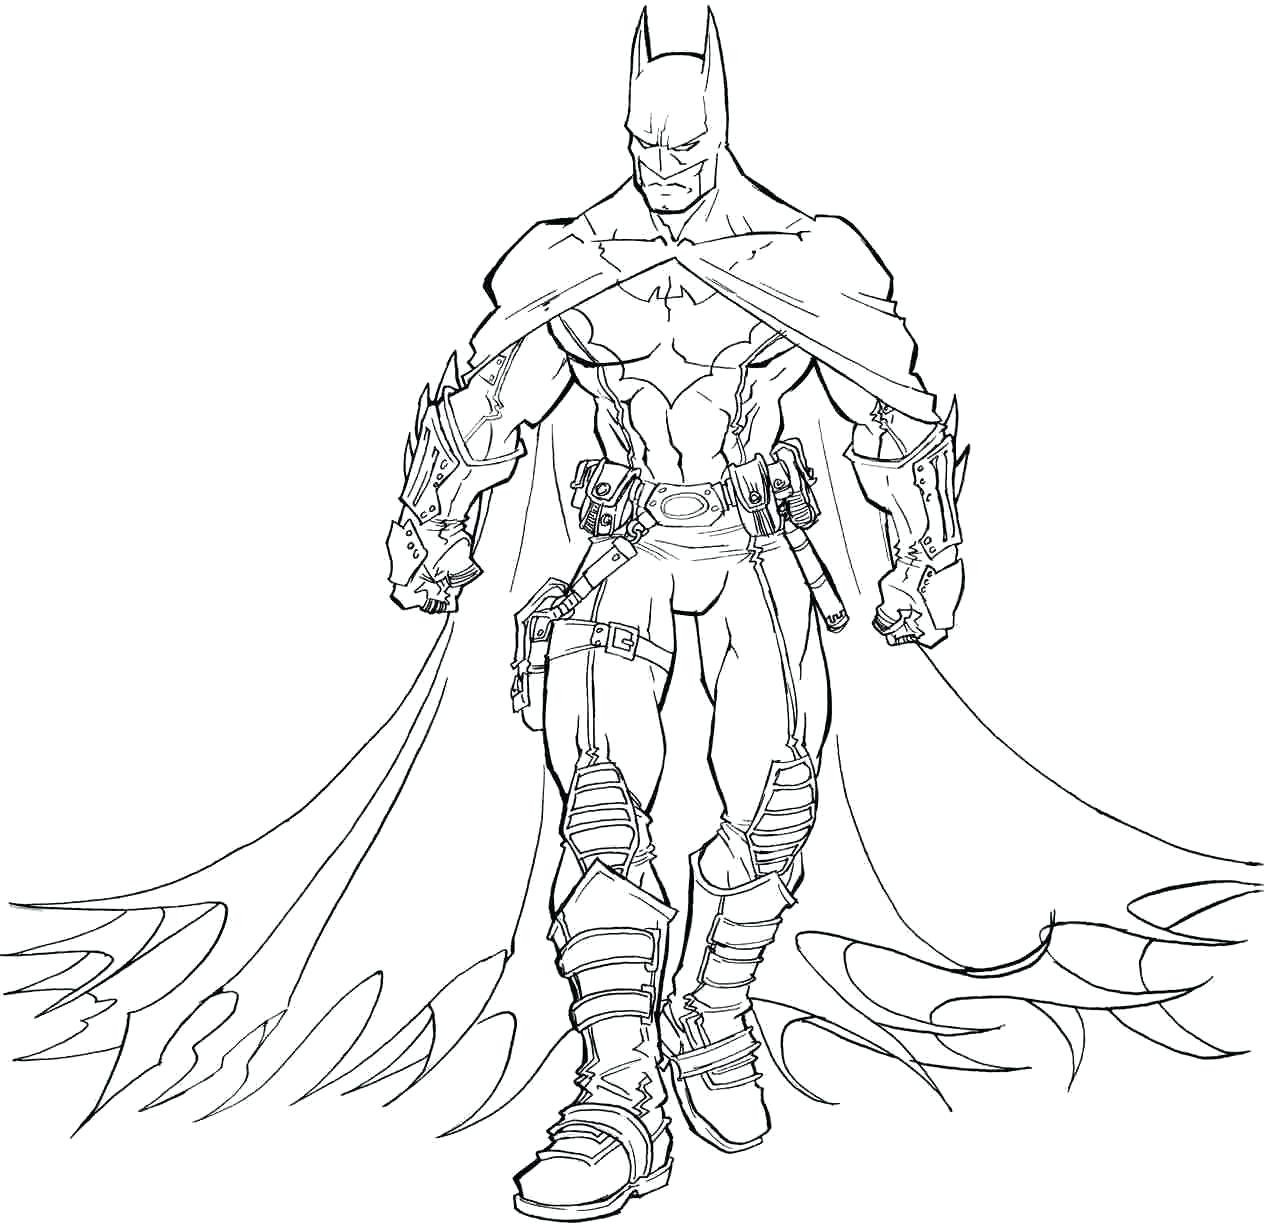 Batman Vs Superman Color Pages Superman For Coloring Crunchprintco